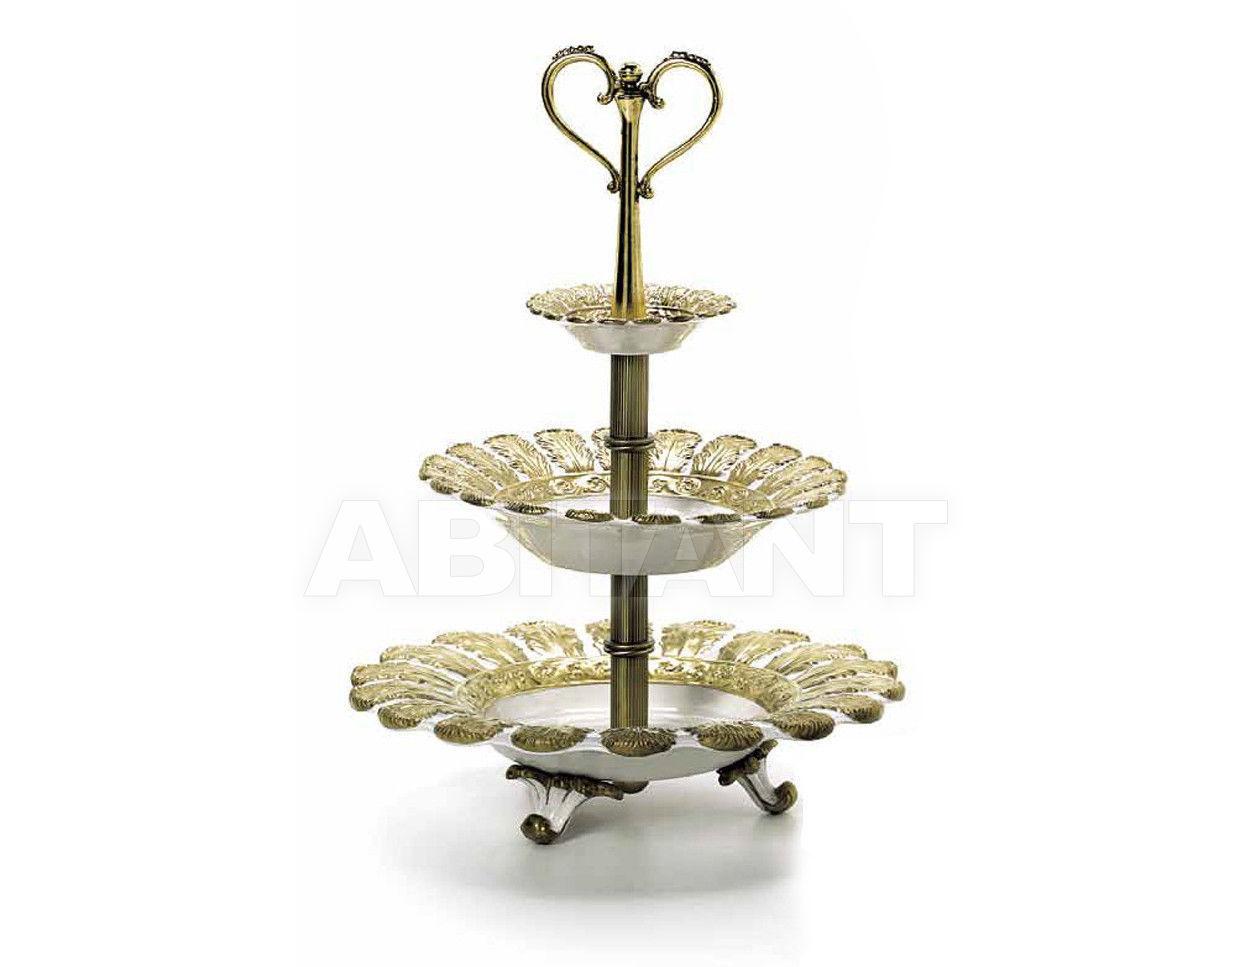 Купить Посуда декоративная  QUEEN ELISABETH Villari Grande Impero Iii 0002279-402